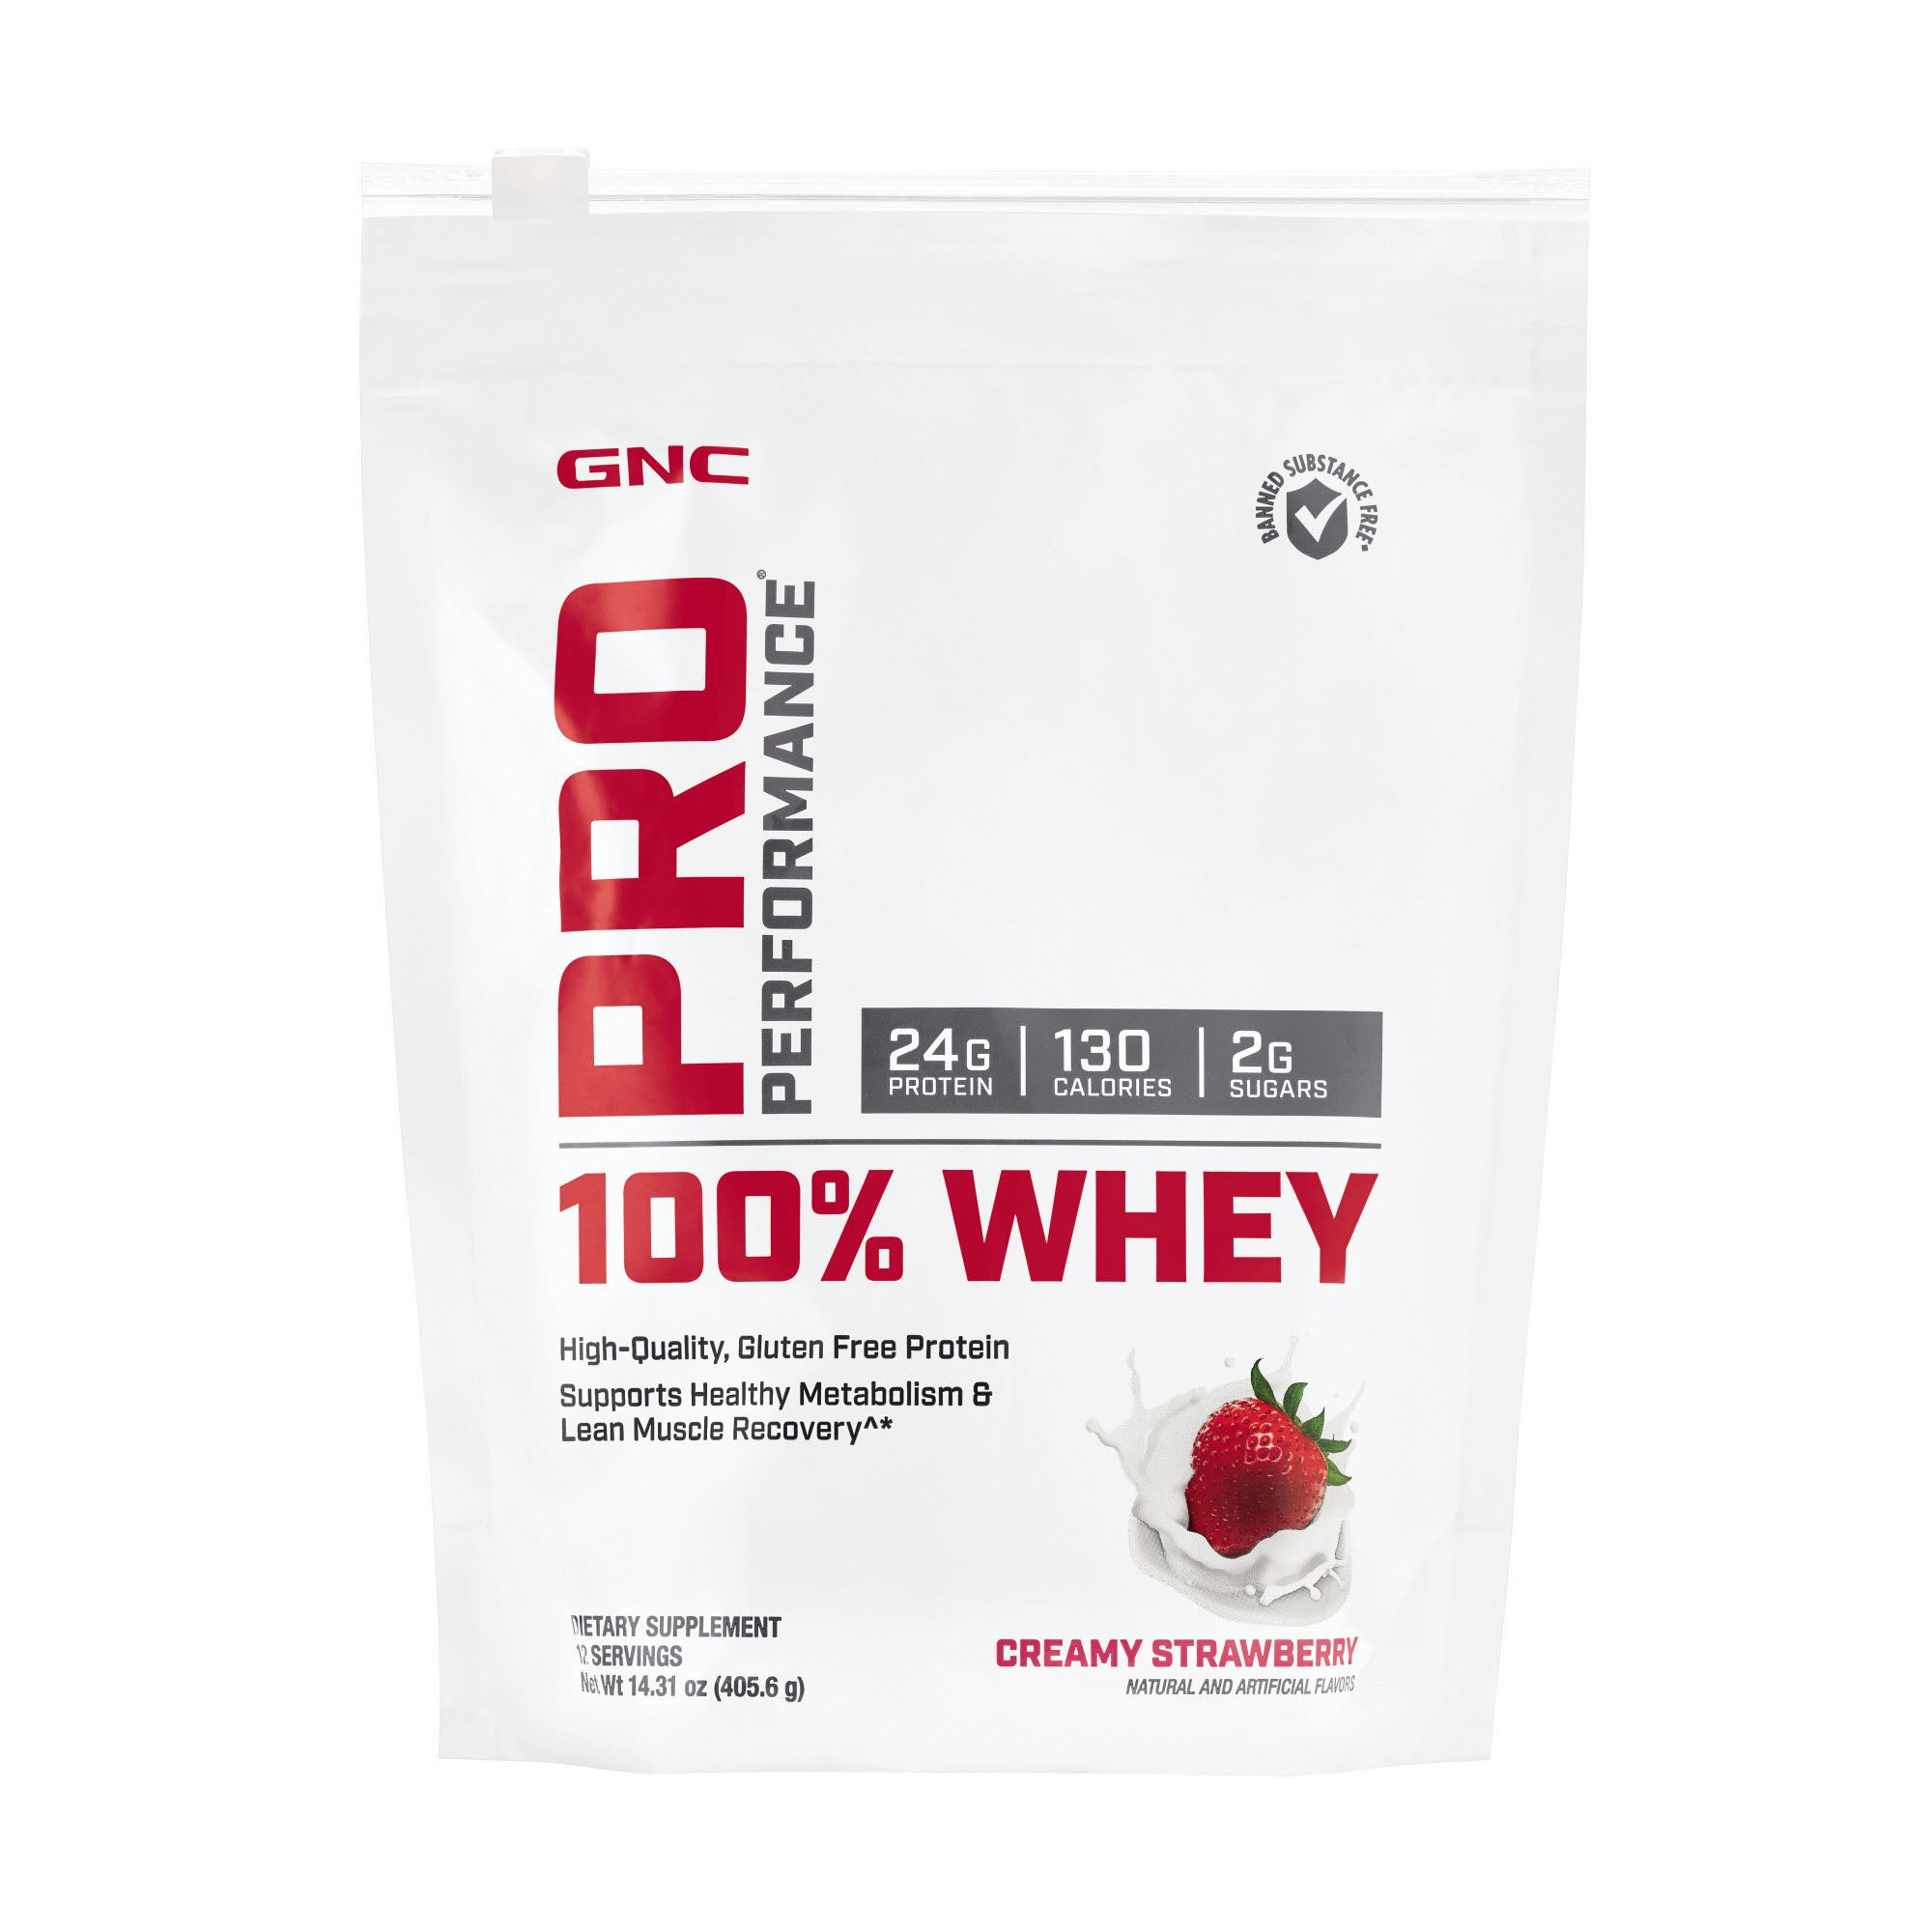 GNC Pro Performance® 100% Whey, Proteina din Zer, cu Aroma de Capsuni, 405.6g